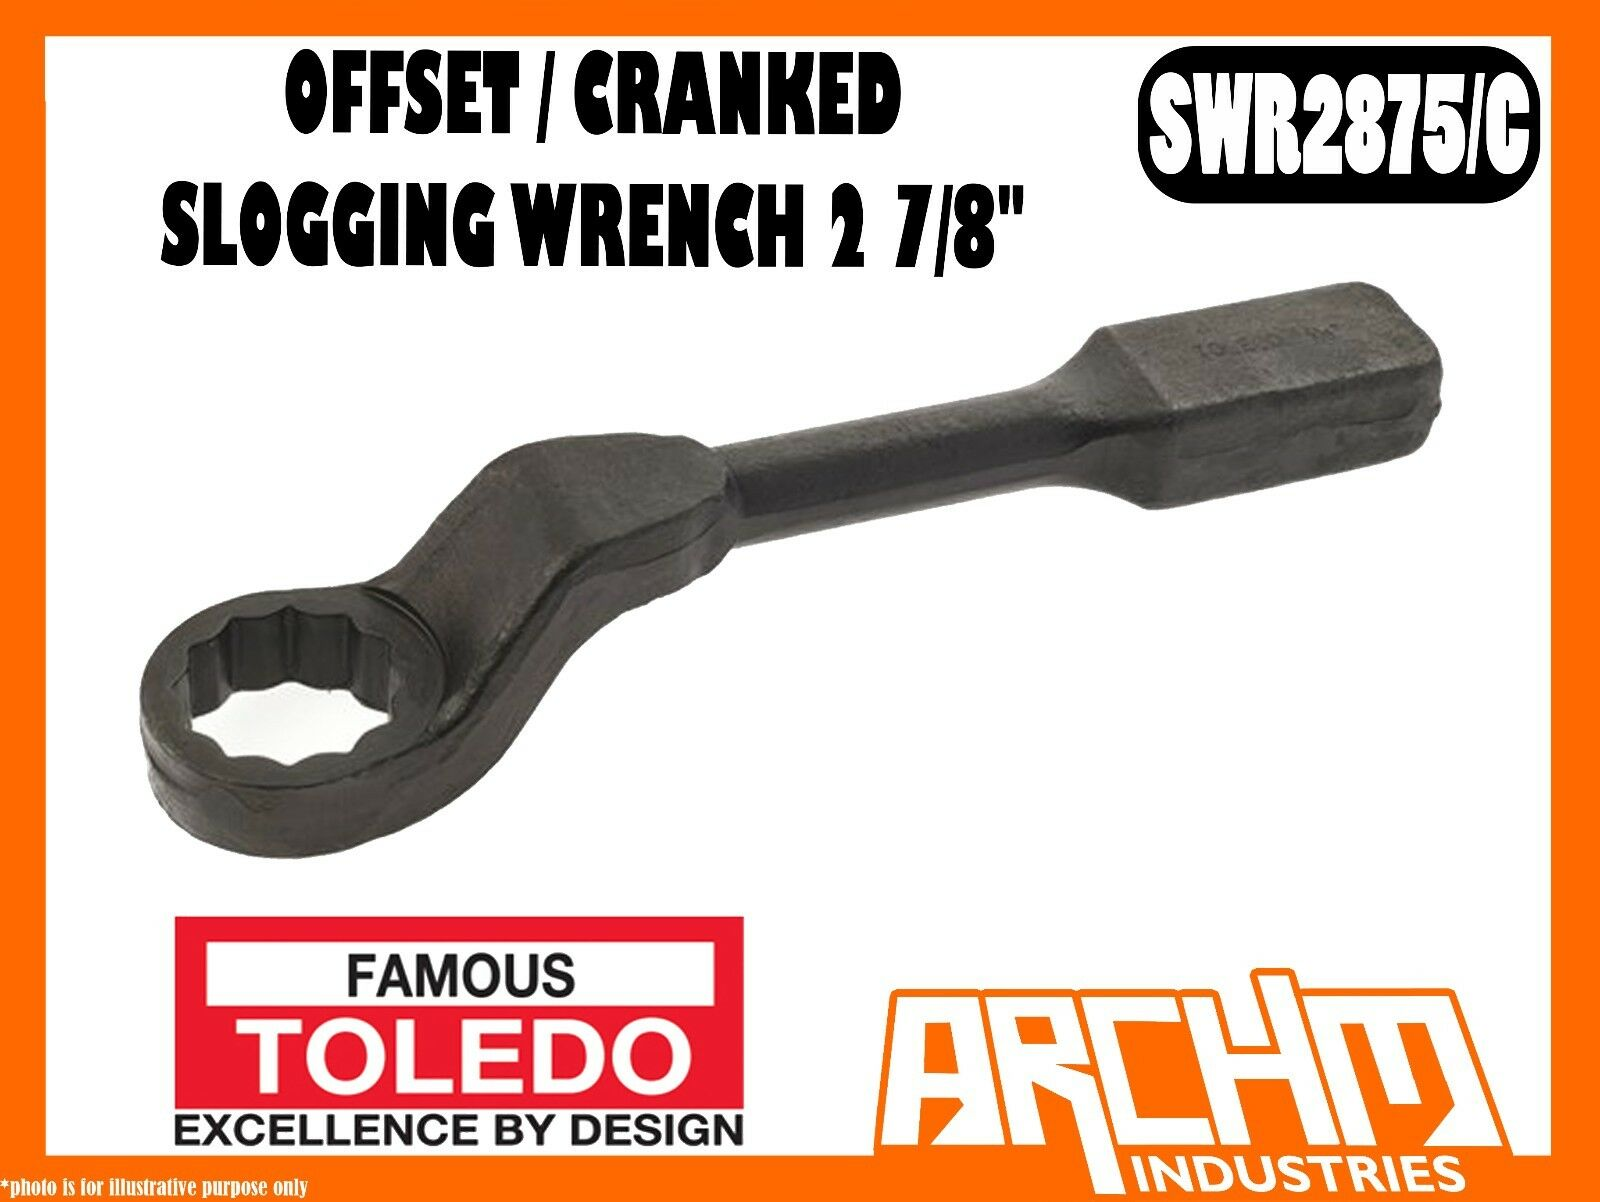 TOLEDO SWR2875 C - OFFSET   CRANKED SLOGGING WRENCH 2 7 8  - IMPERIAL